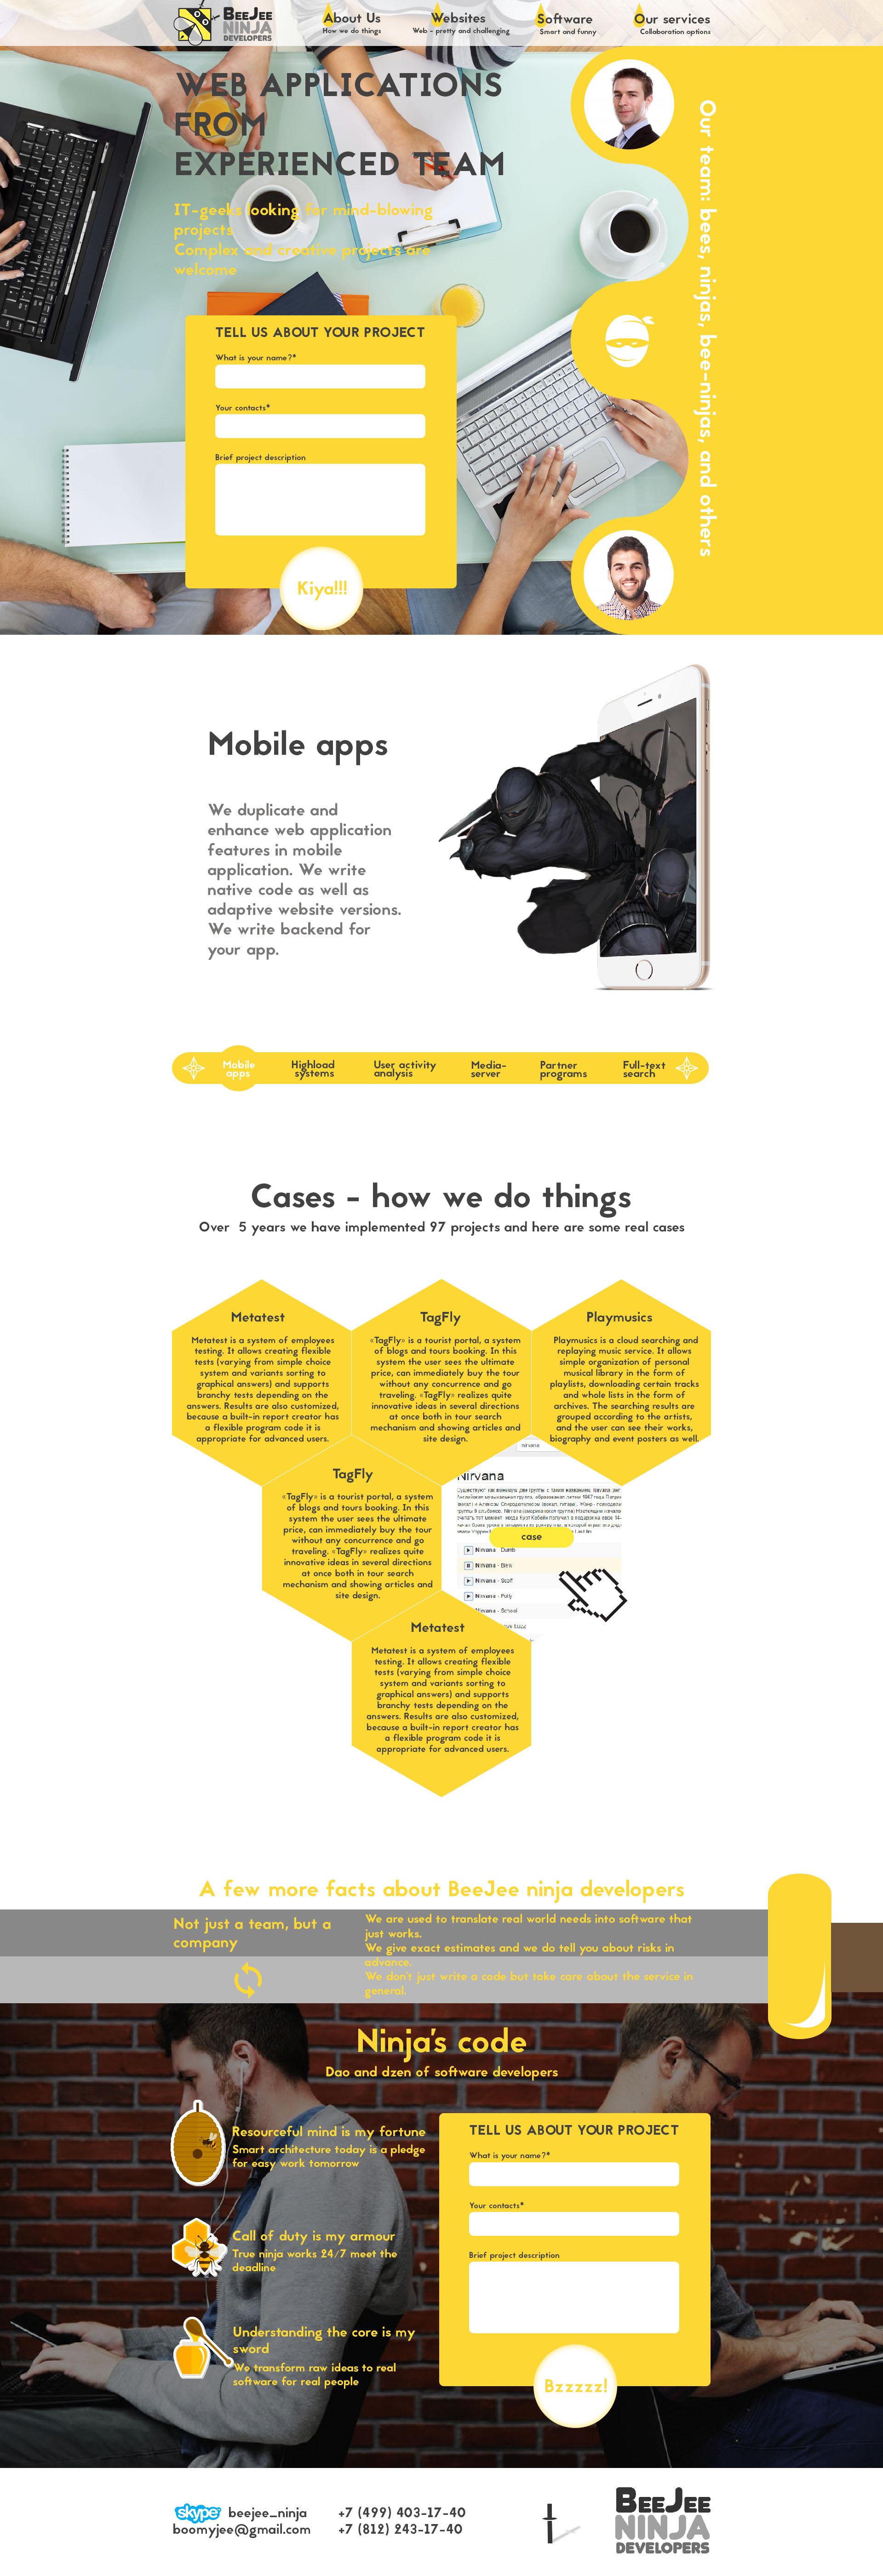 Концепт дизайна сайта в корпоративном стиле для IT компании фото f_9445958f3609c59c.jpg